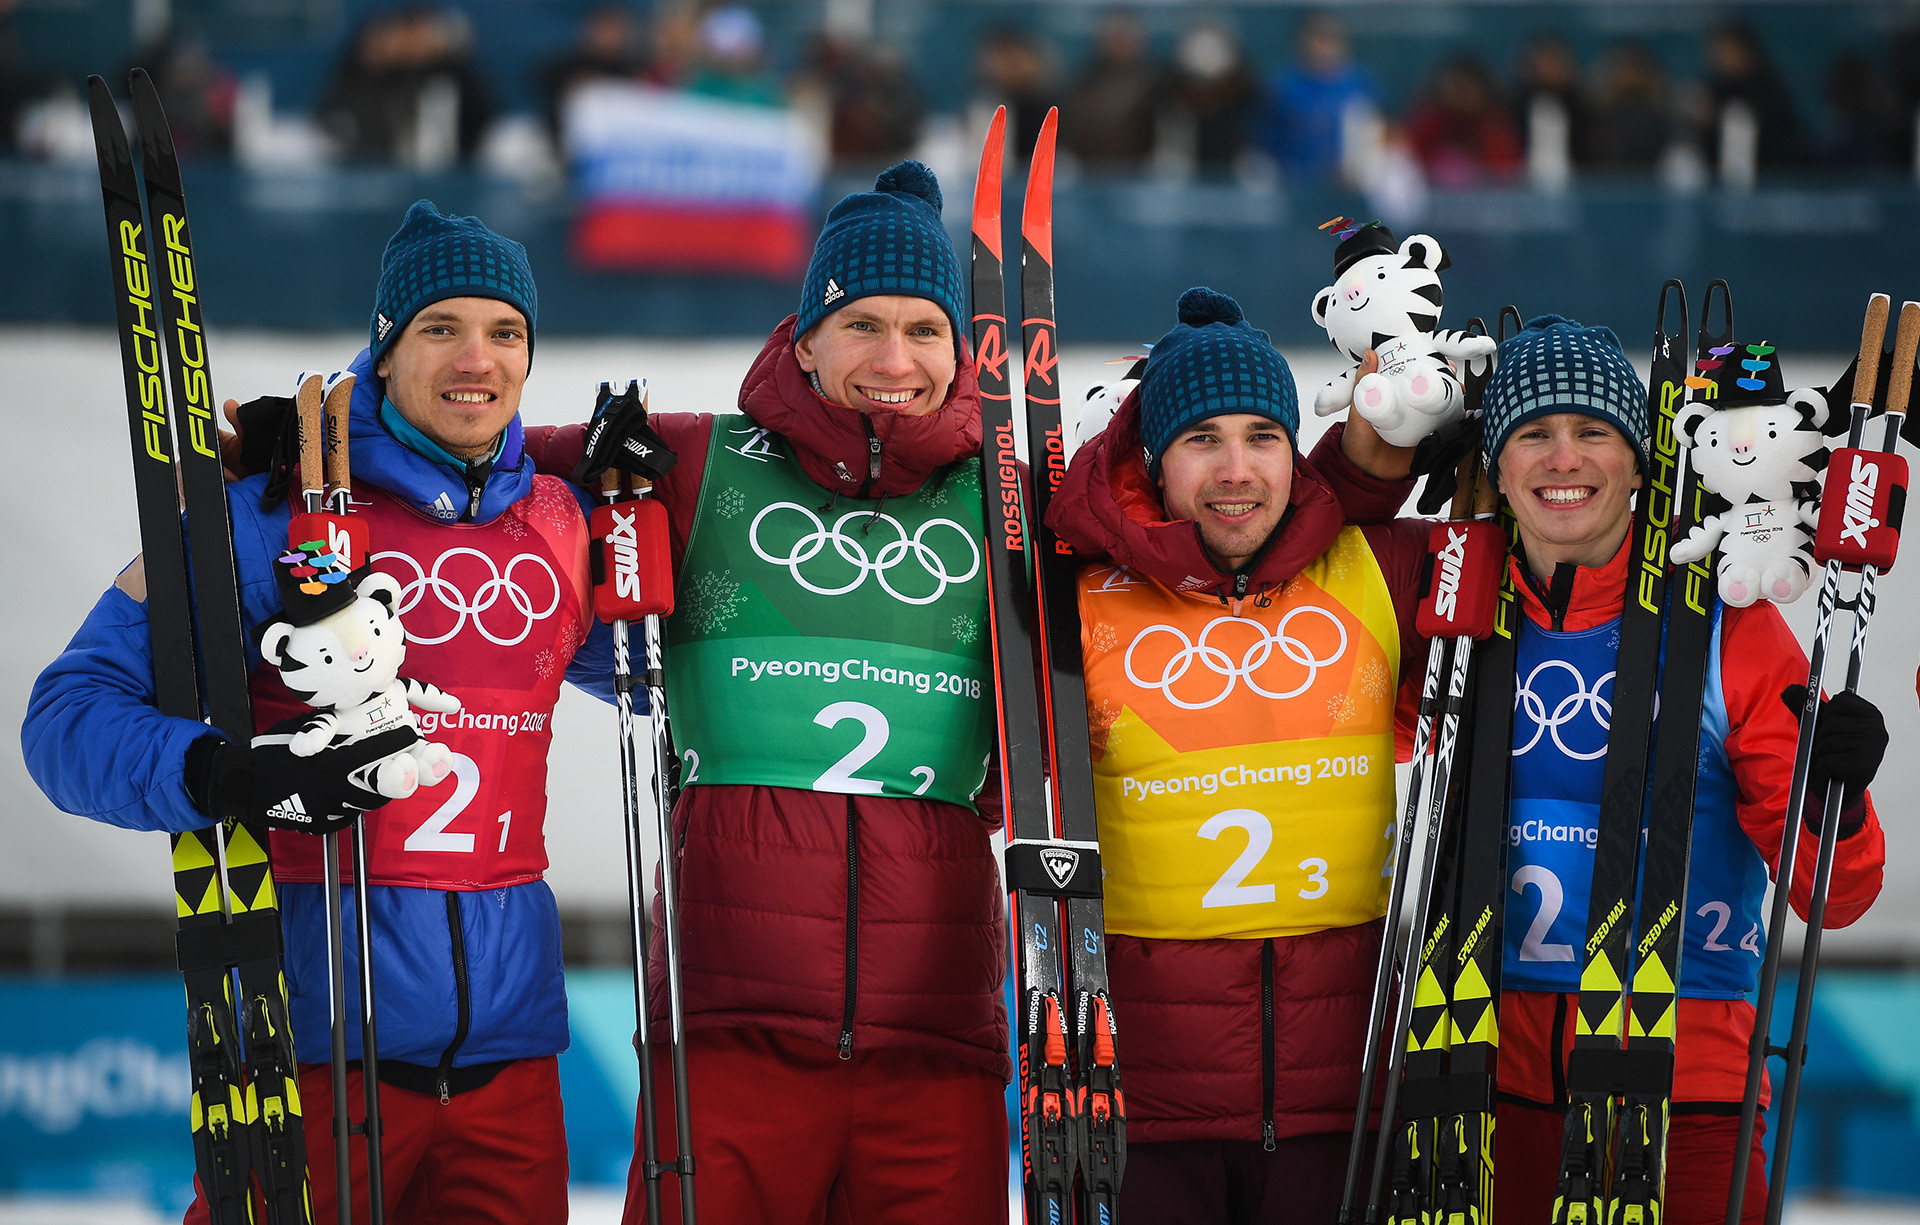 De la izq. a la der.: Andréi Larkov, Alexander Bolshunov, Alexéi Chervotkin and Denís Spitsov